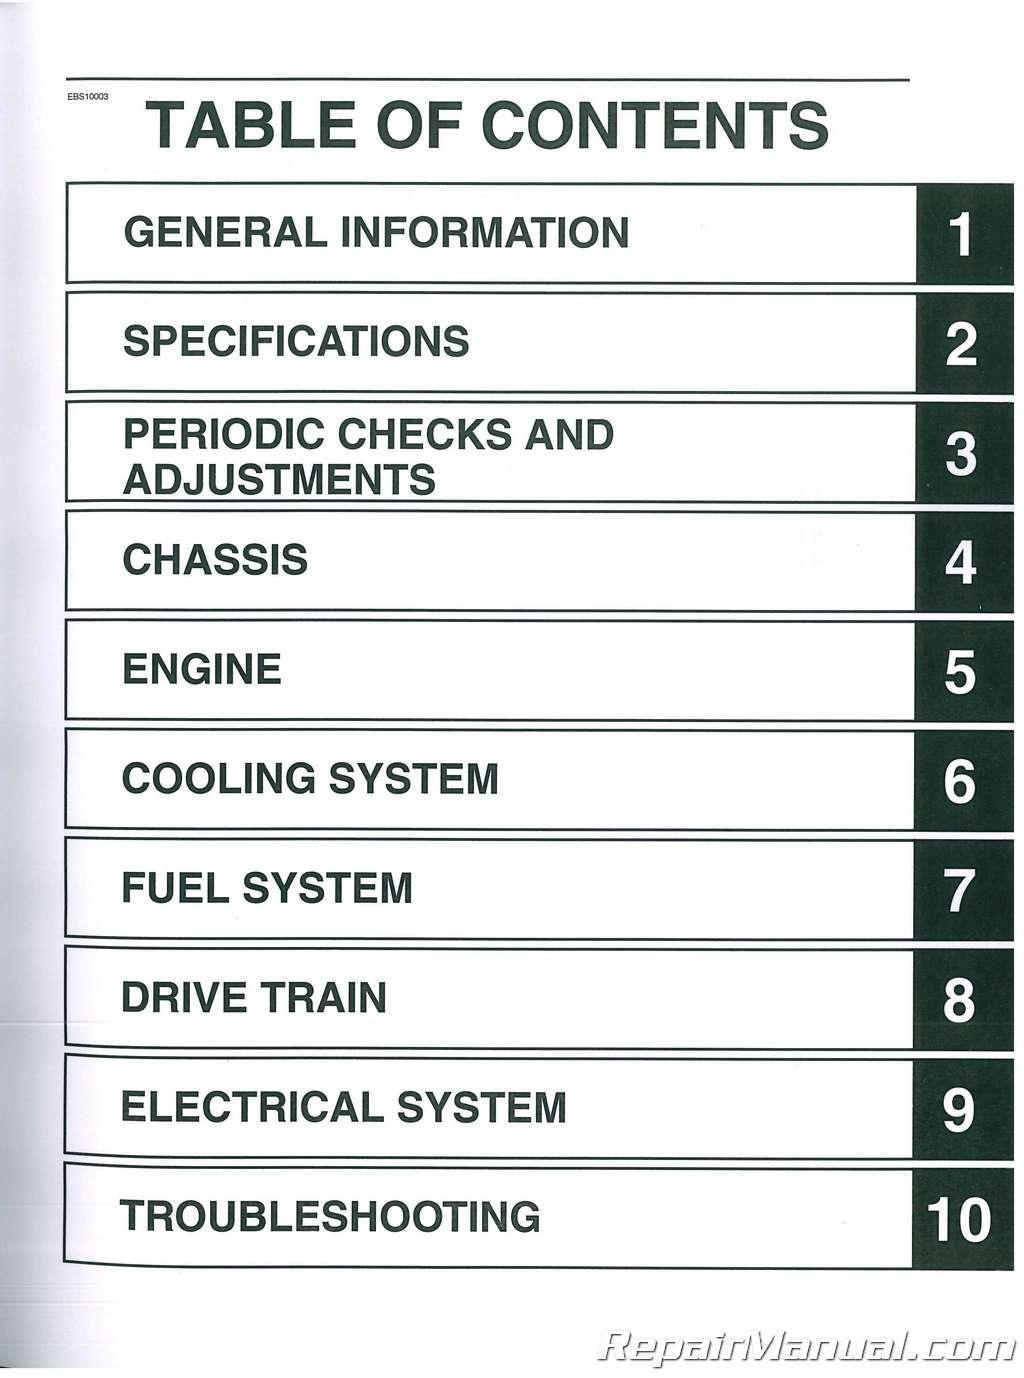 Honda Owners Manual >> 2017 - 2018 Yamaha Grizzly 700 ATV Service Manual